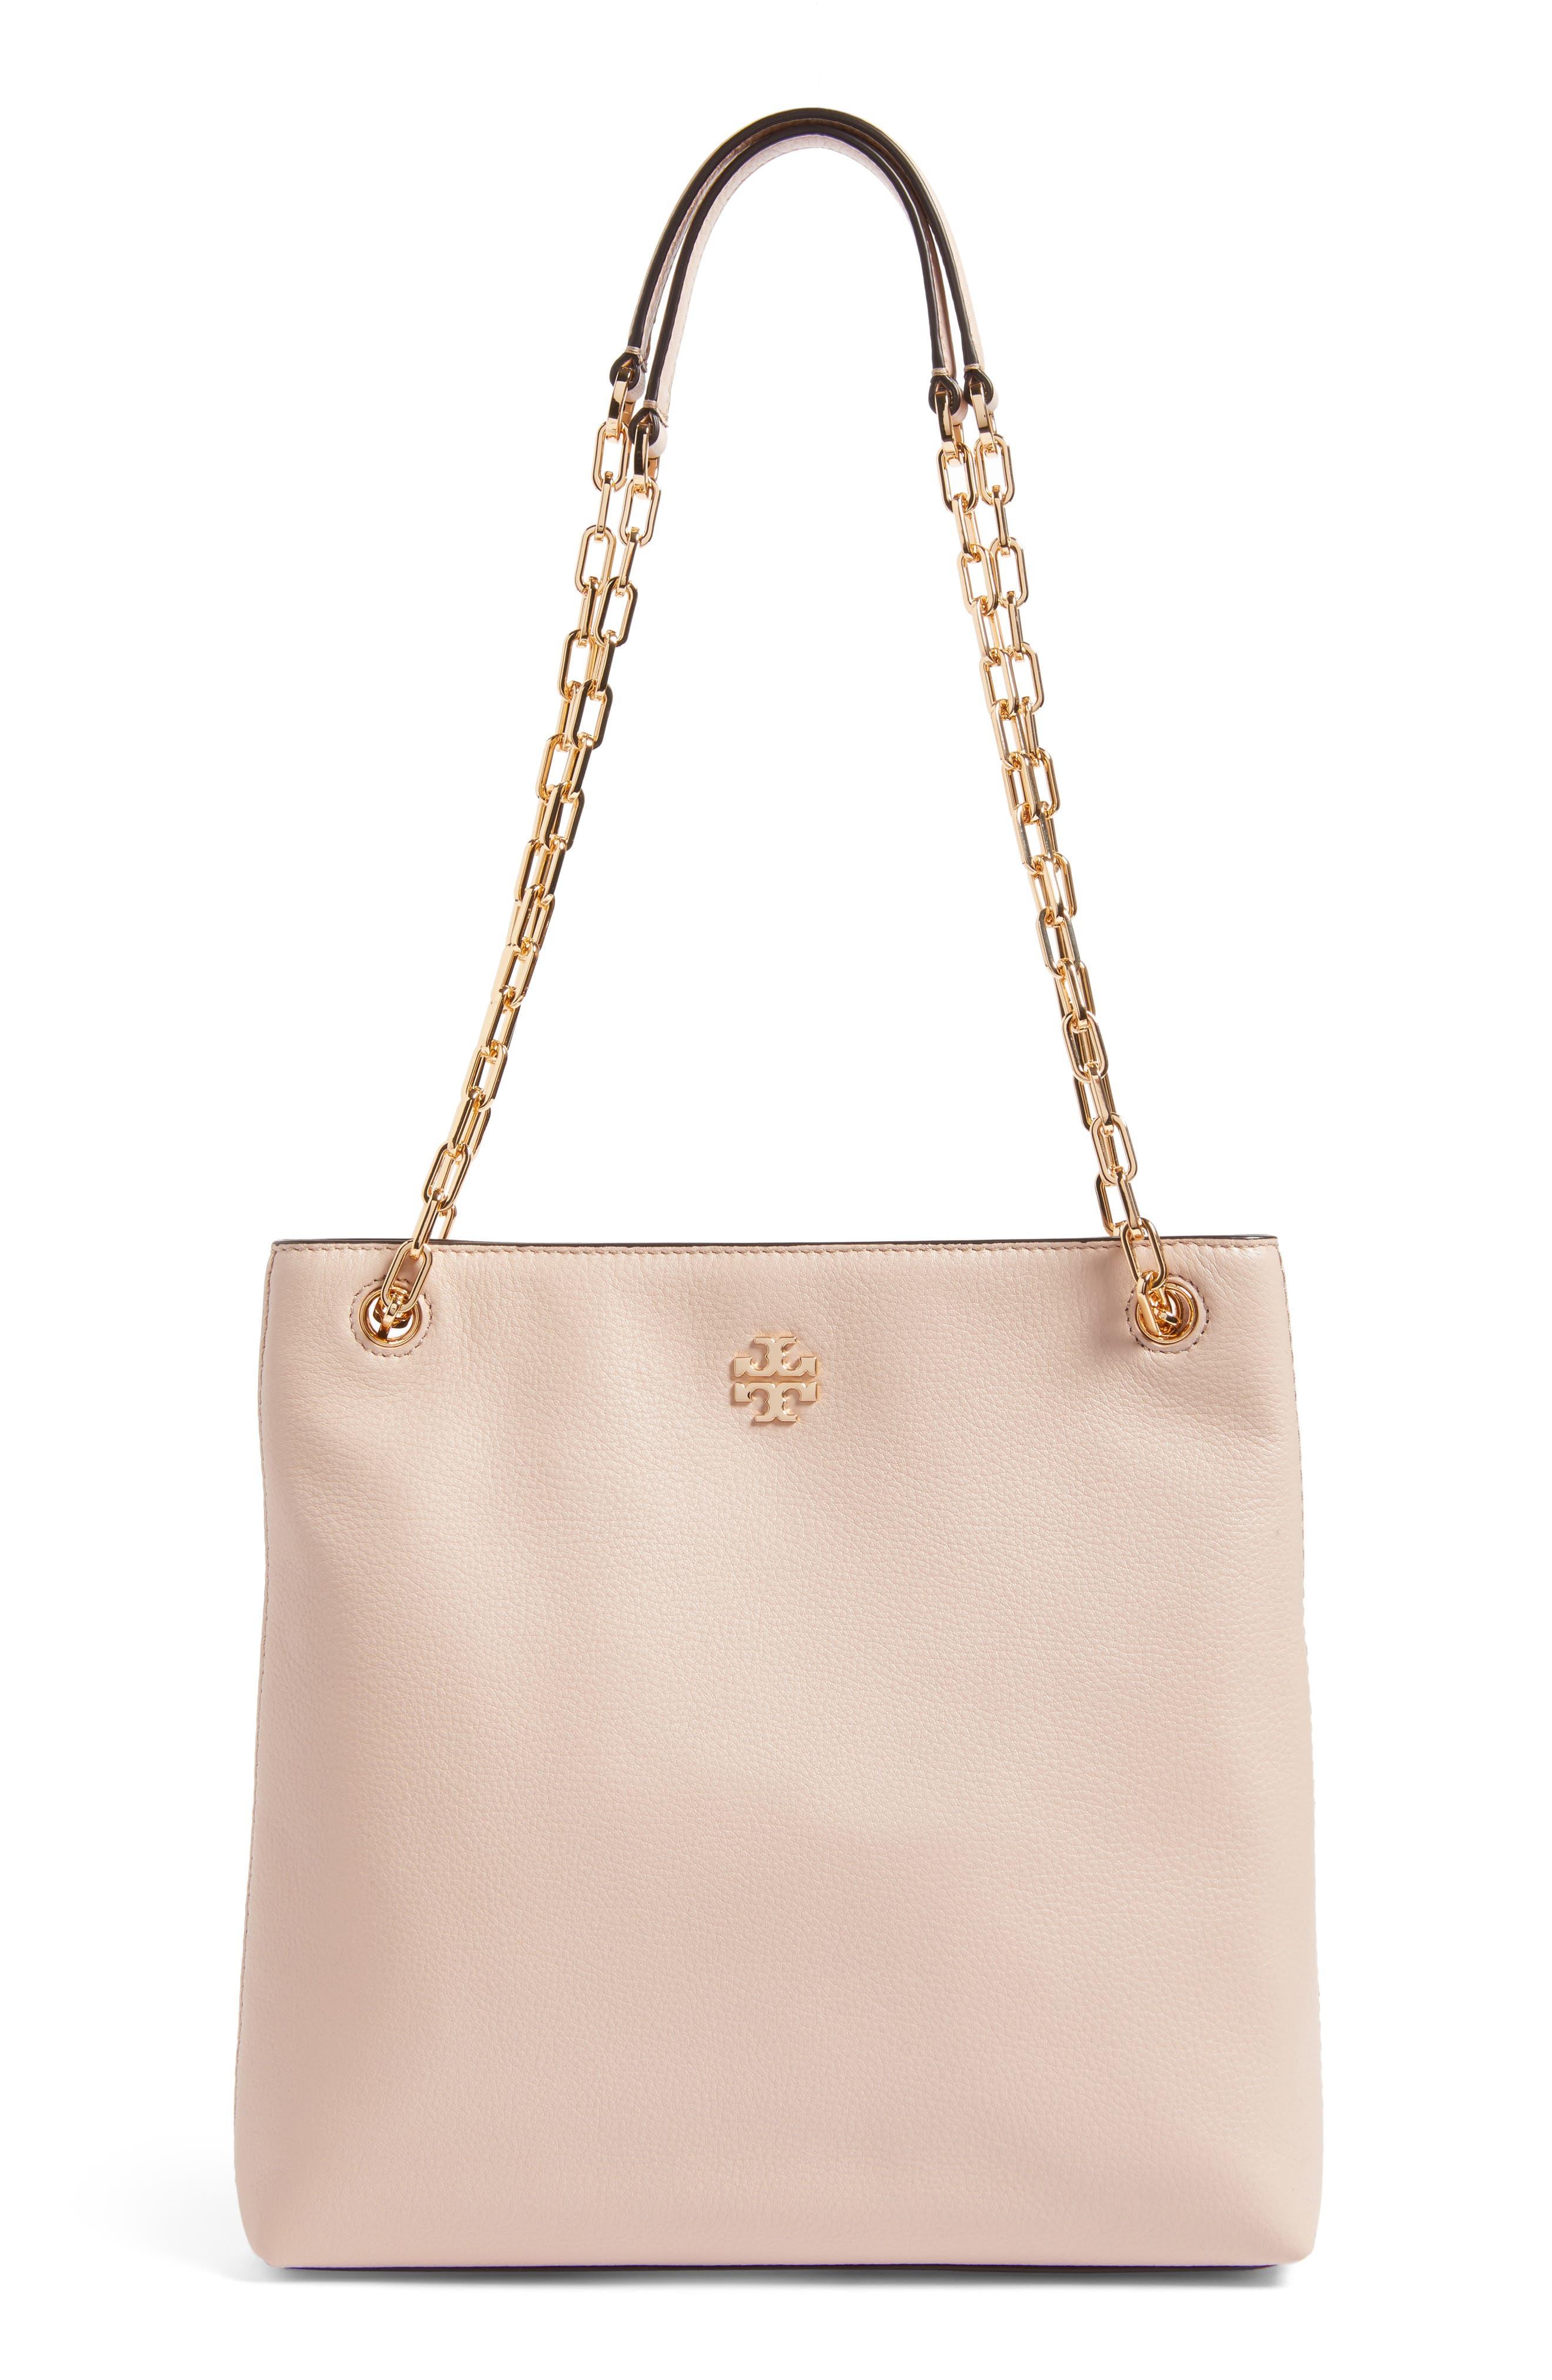 Frida Swingpack Leather Crossbody Bag,                             Main thumbnail 1, color,                             Light Oak